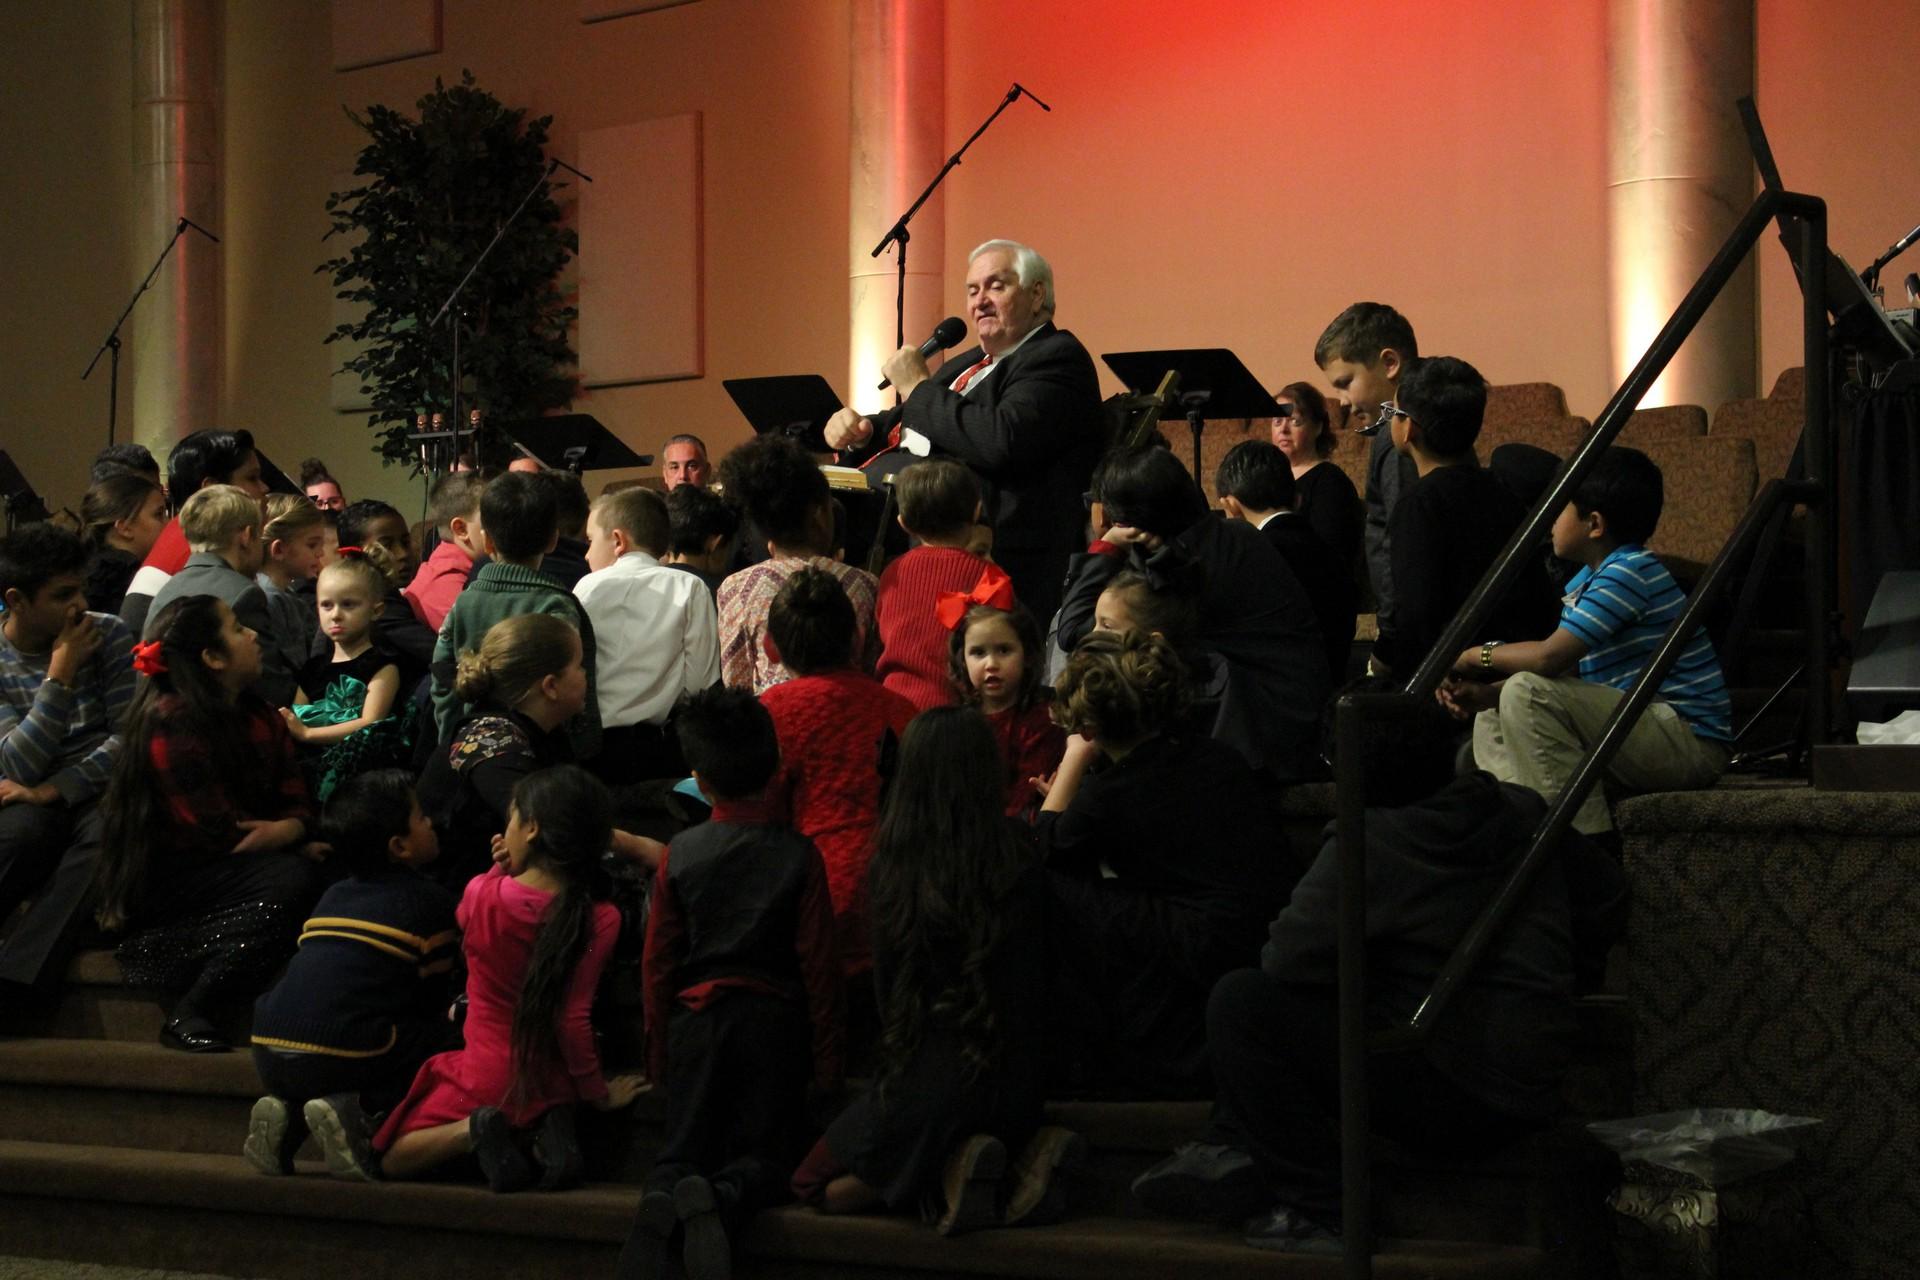 Christmas Concert | December 17, 2017